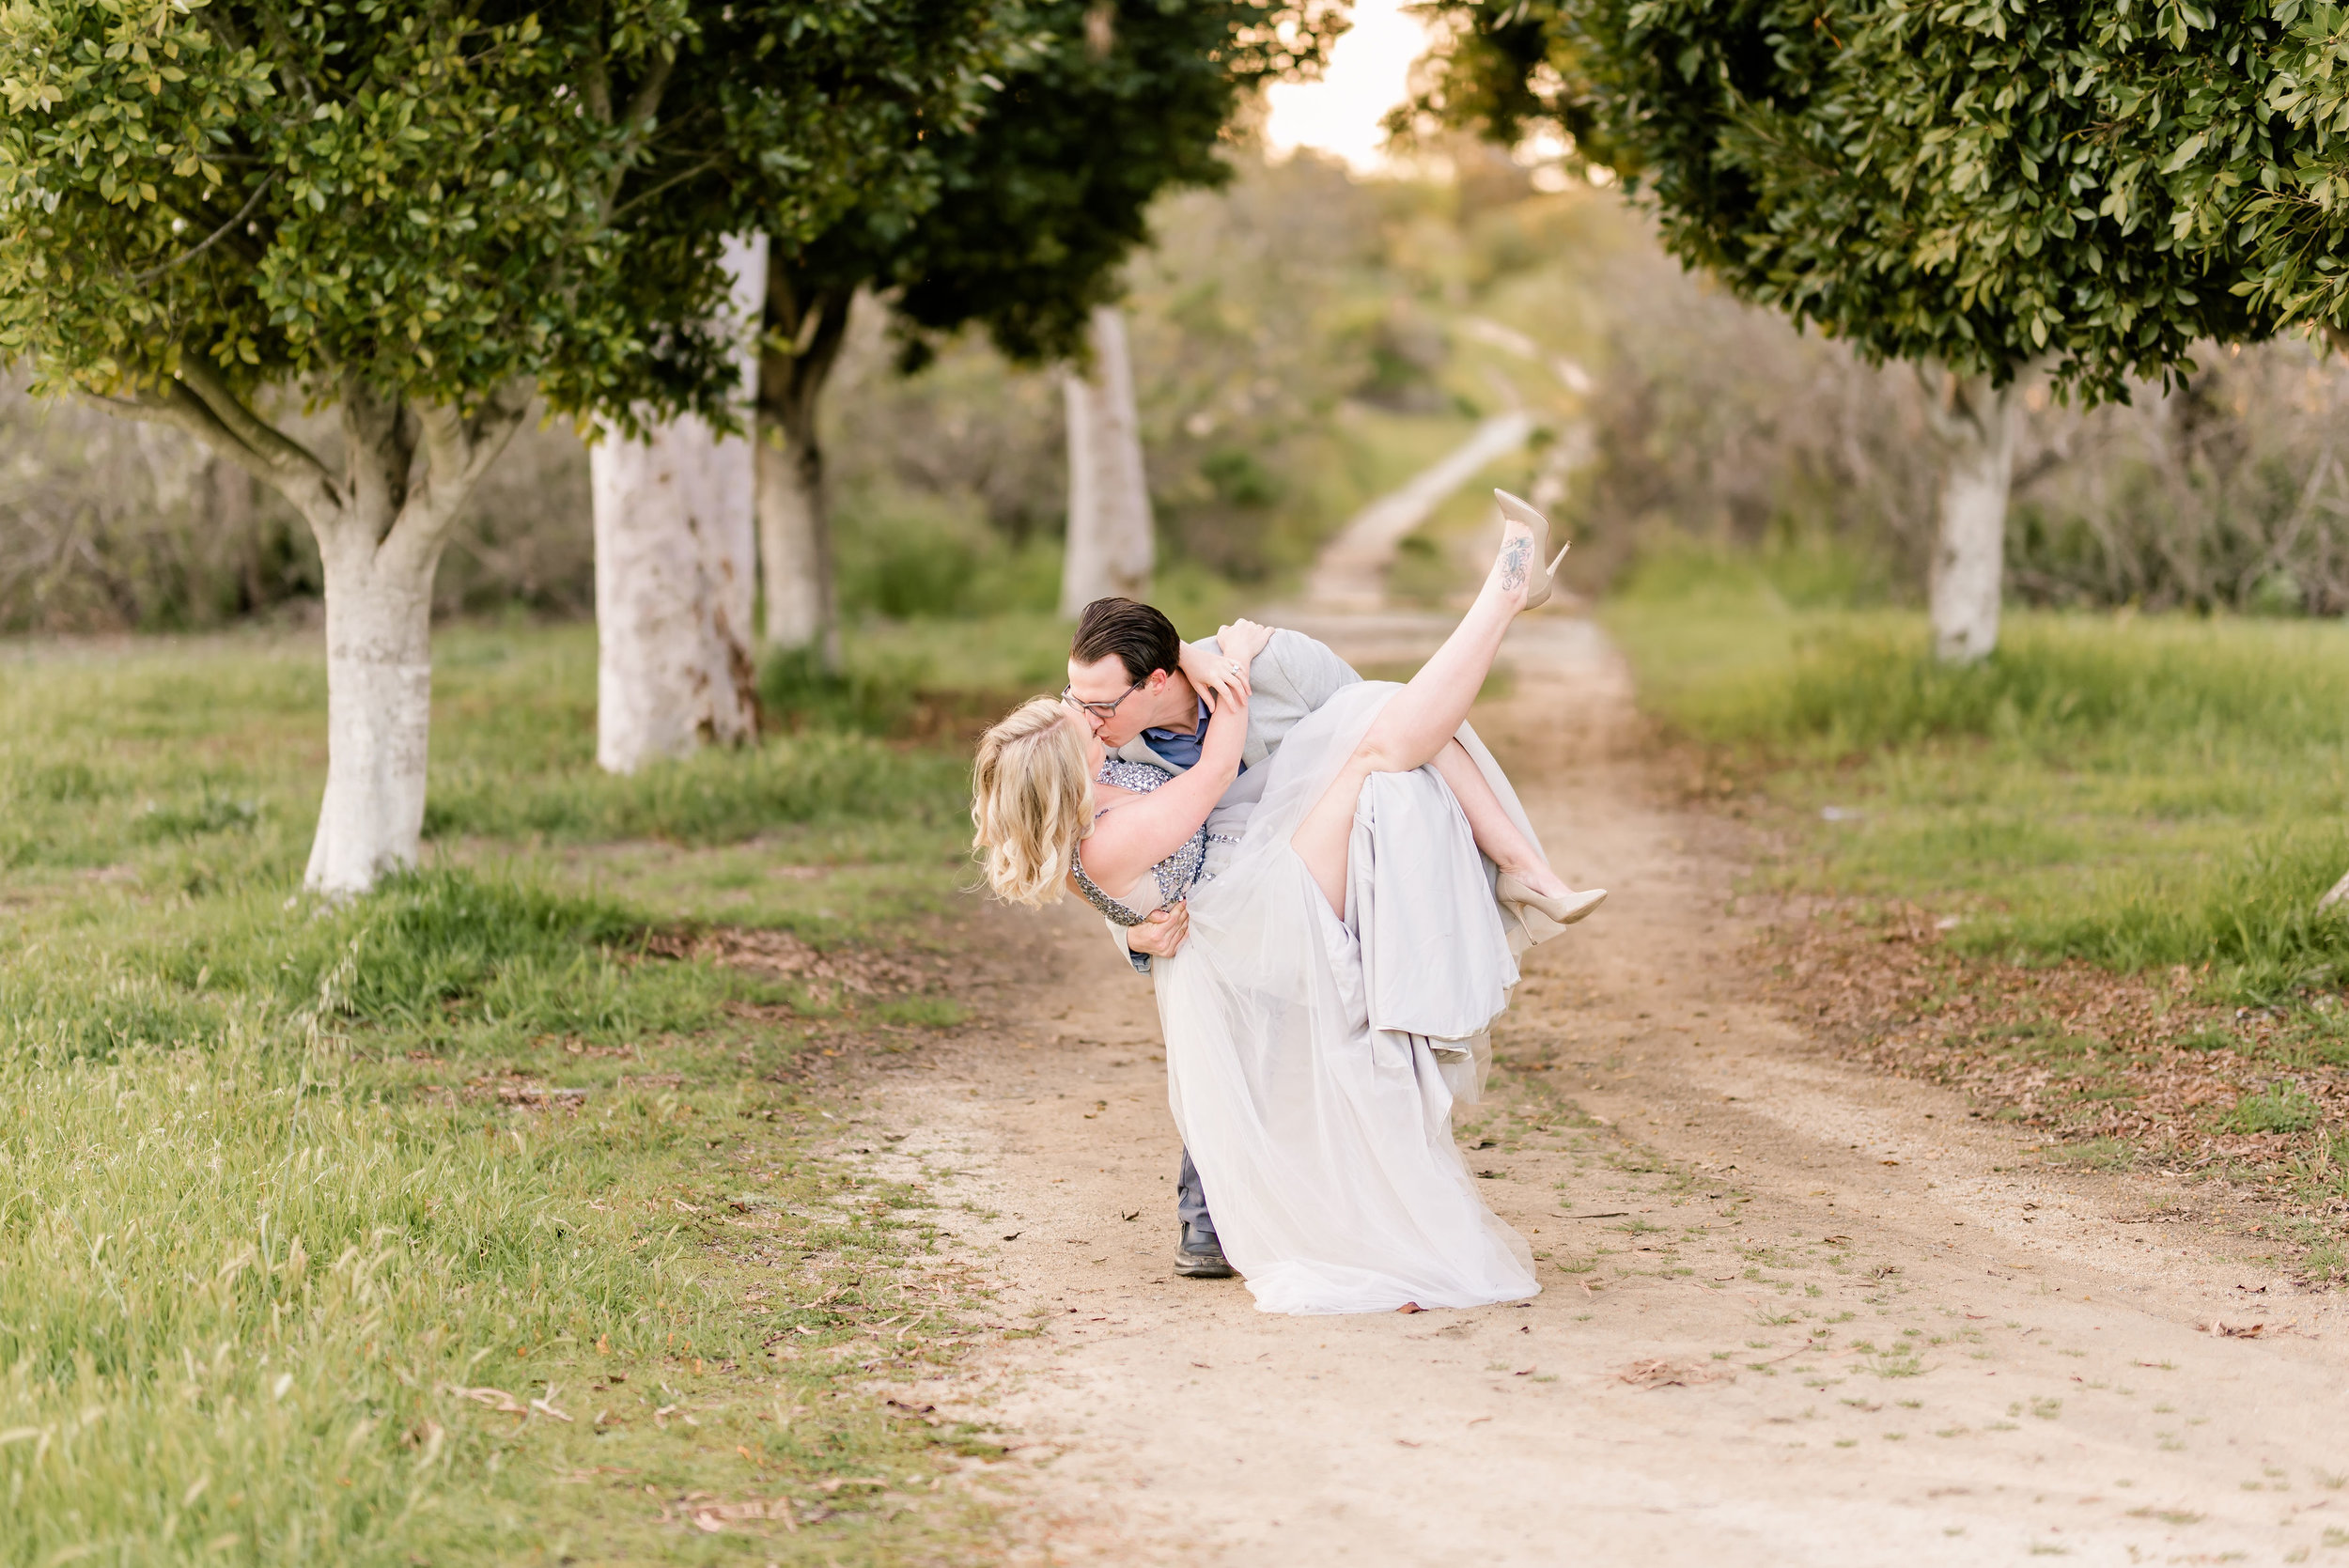 Ann Vestal San Diego Wedding Photographer